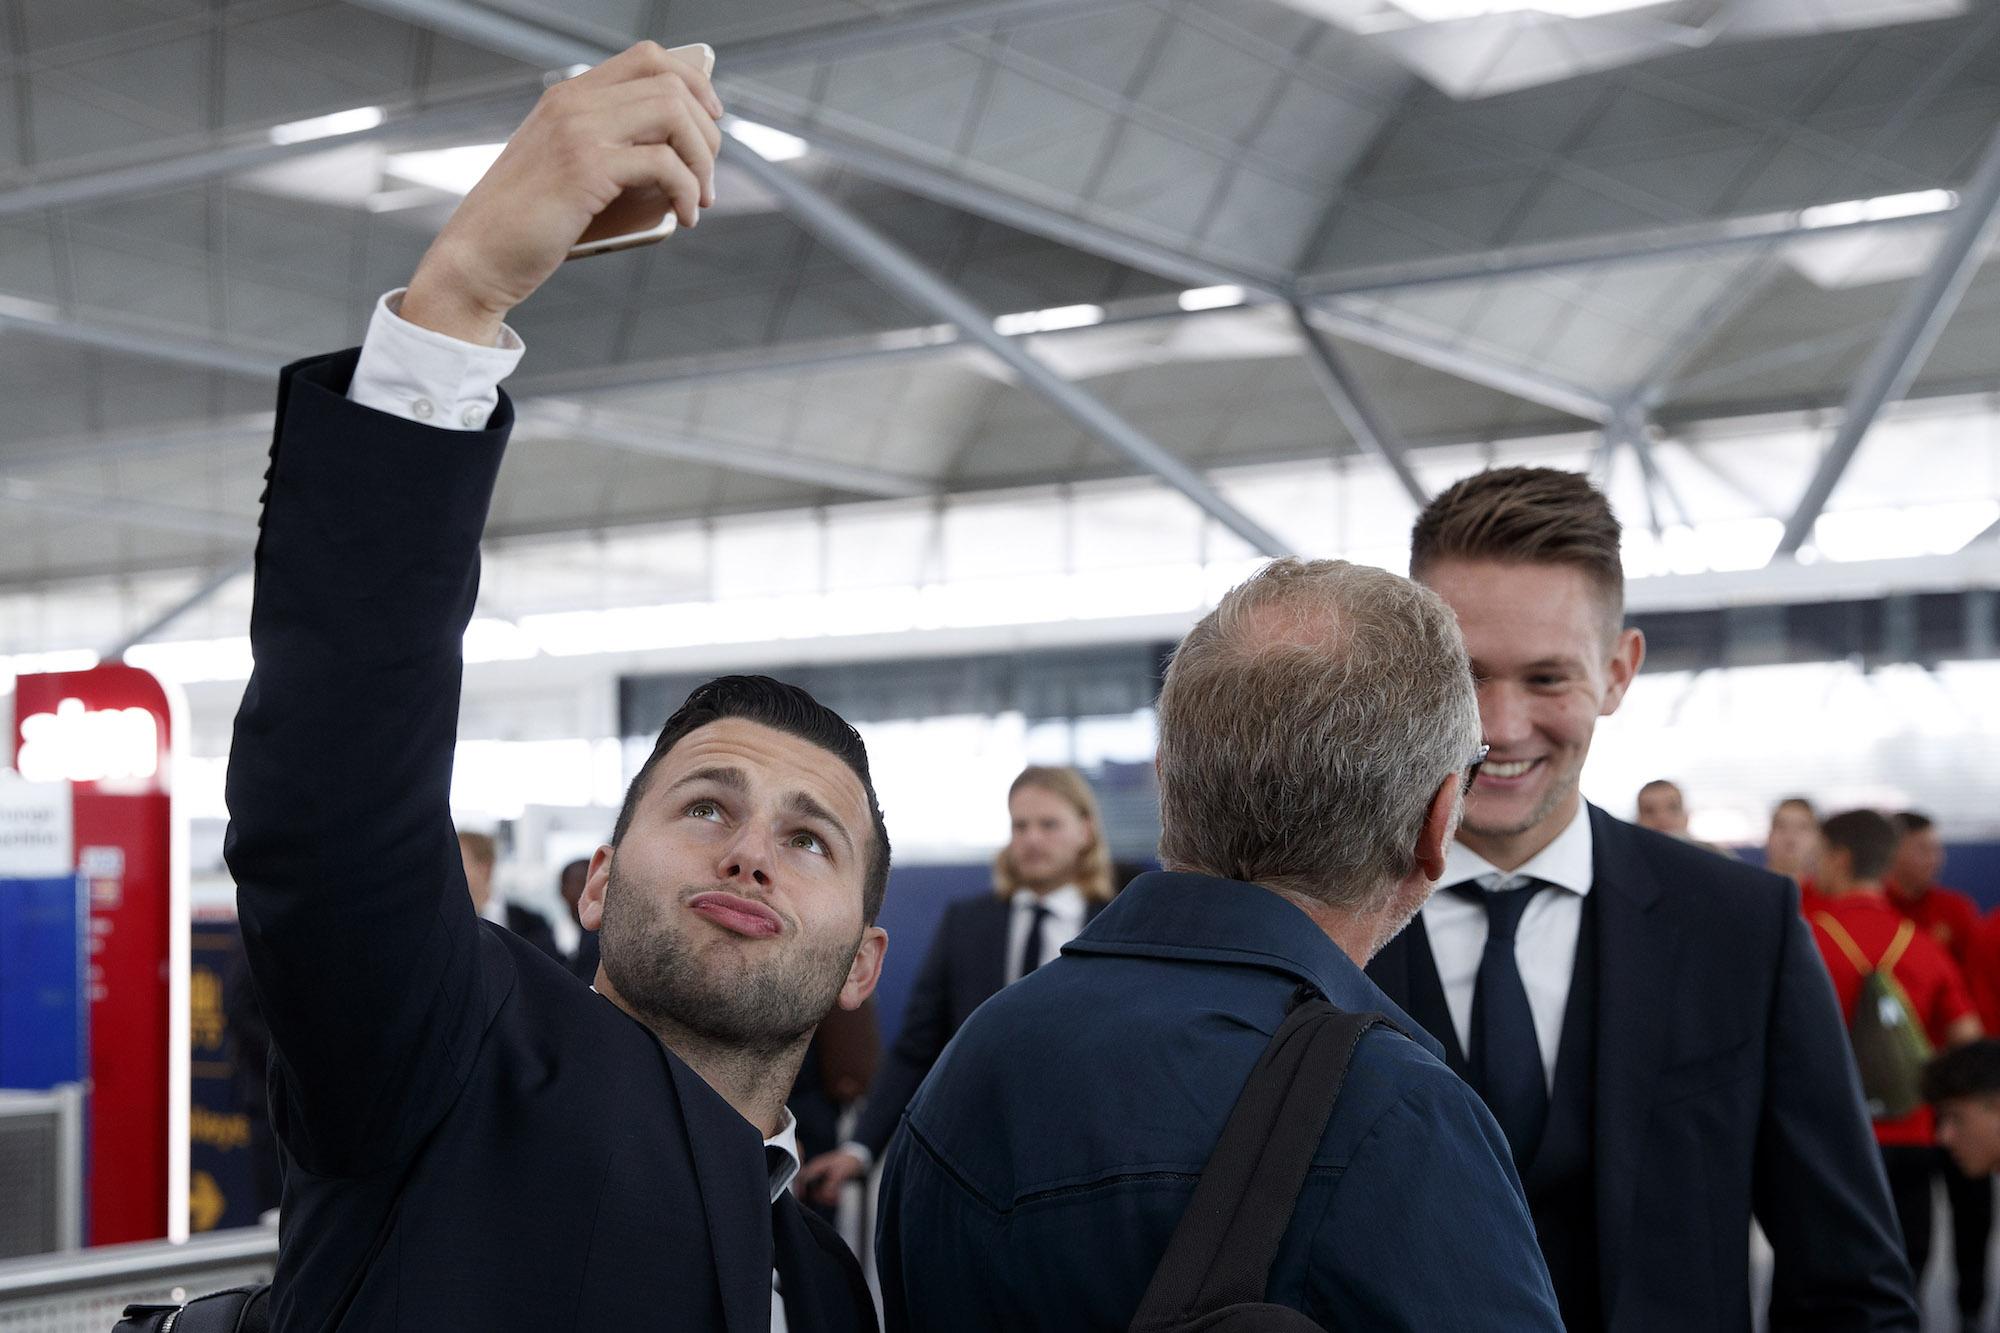 27.09.2016; London; Fussball Champions League - Reise FC Basel; Renato Steffen (Basel) macht Selfie bei der Ankunft am Flughafen Stansted (Christian Pfander/freshfocus)